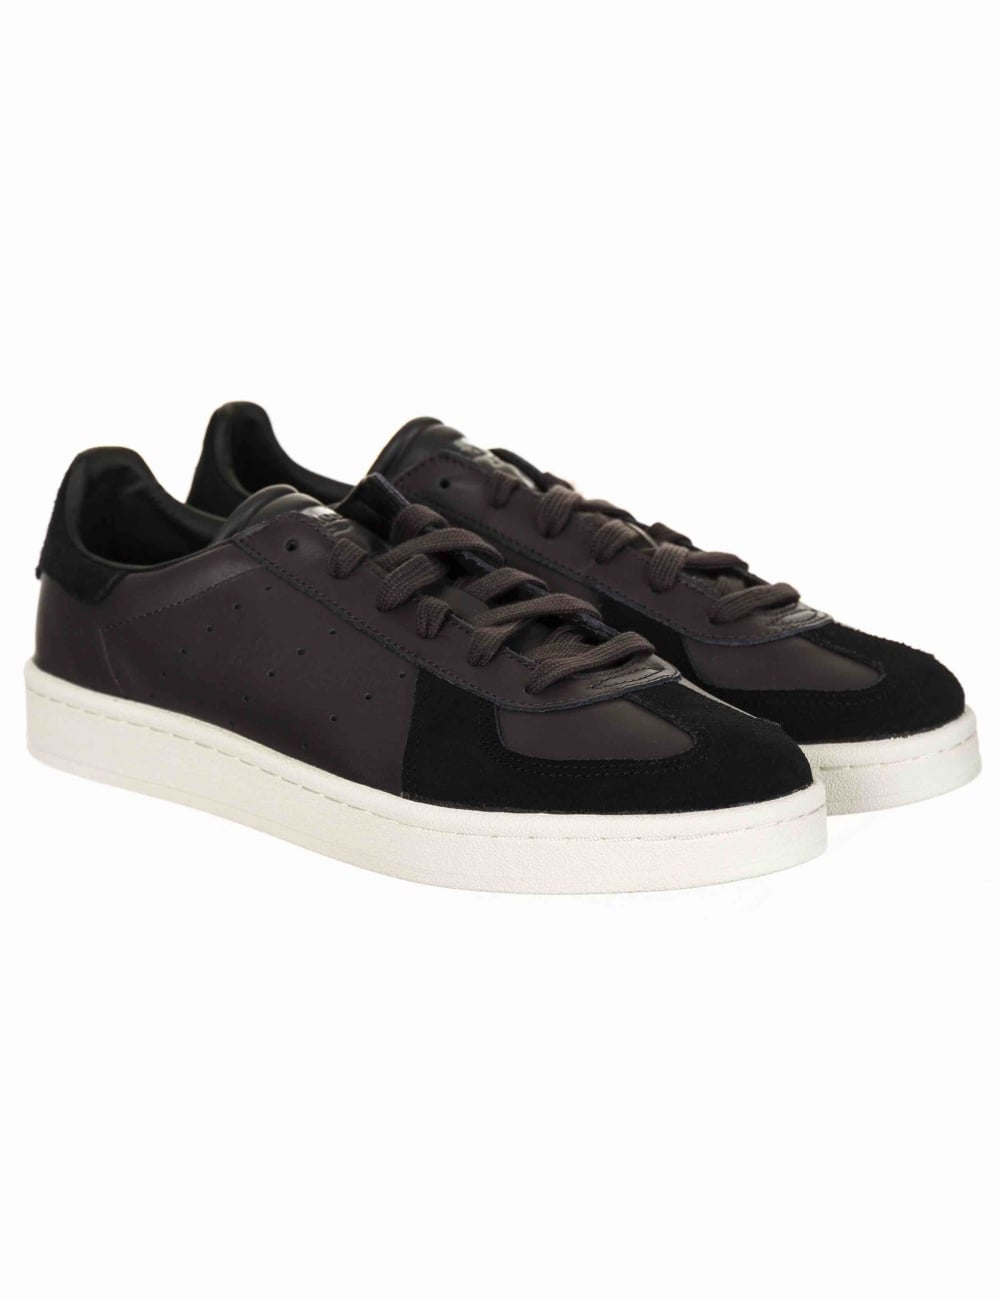 6151a751b038 Adidas Originals BW Avenue Trainers - Core Black Off White ...